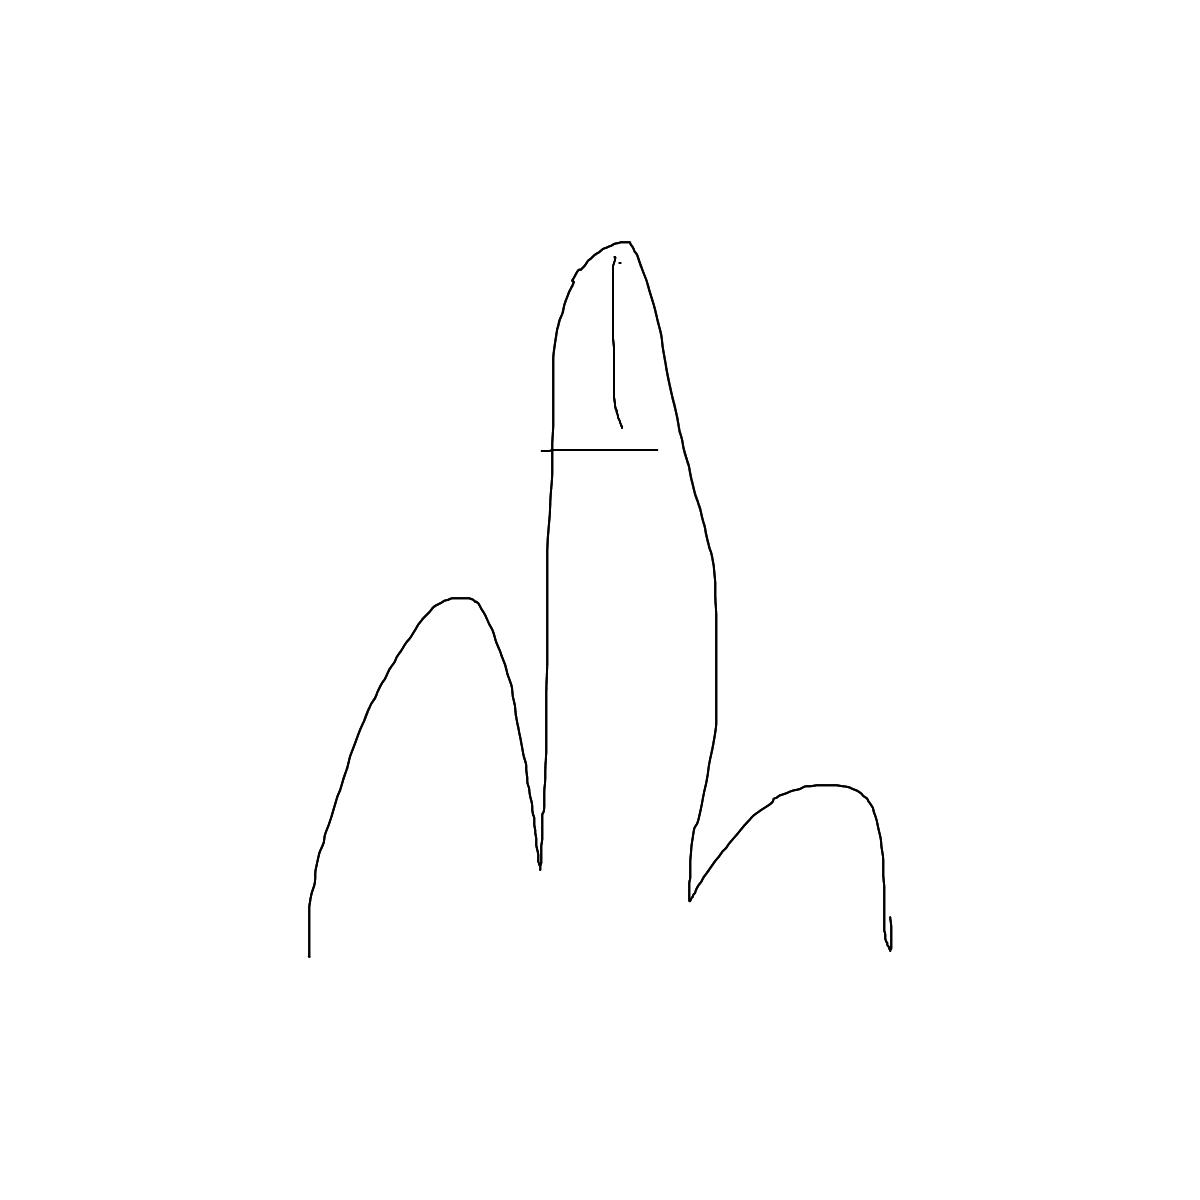 BAAAM drawing#1594 lat:52.9927406311035160lng: 16.9246978759765620